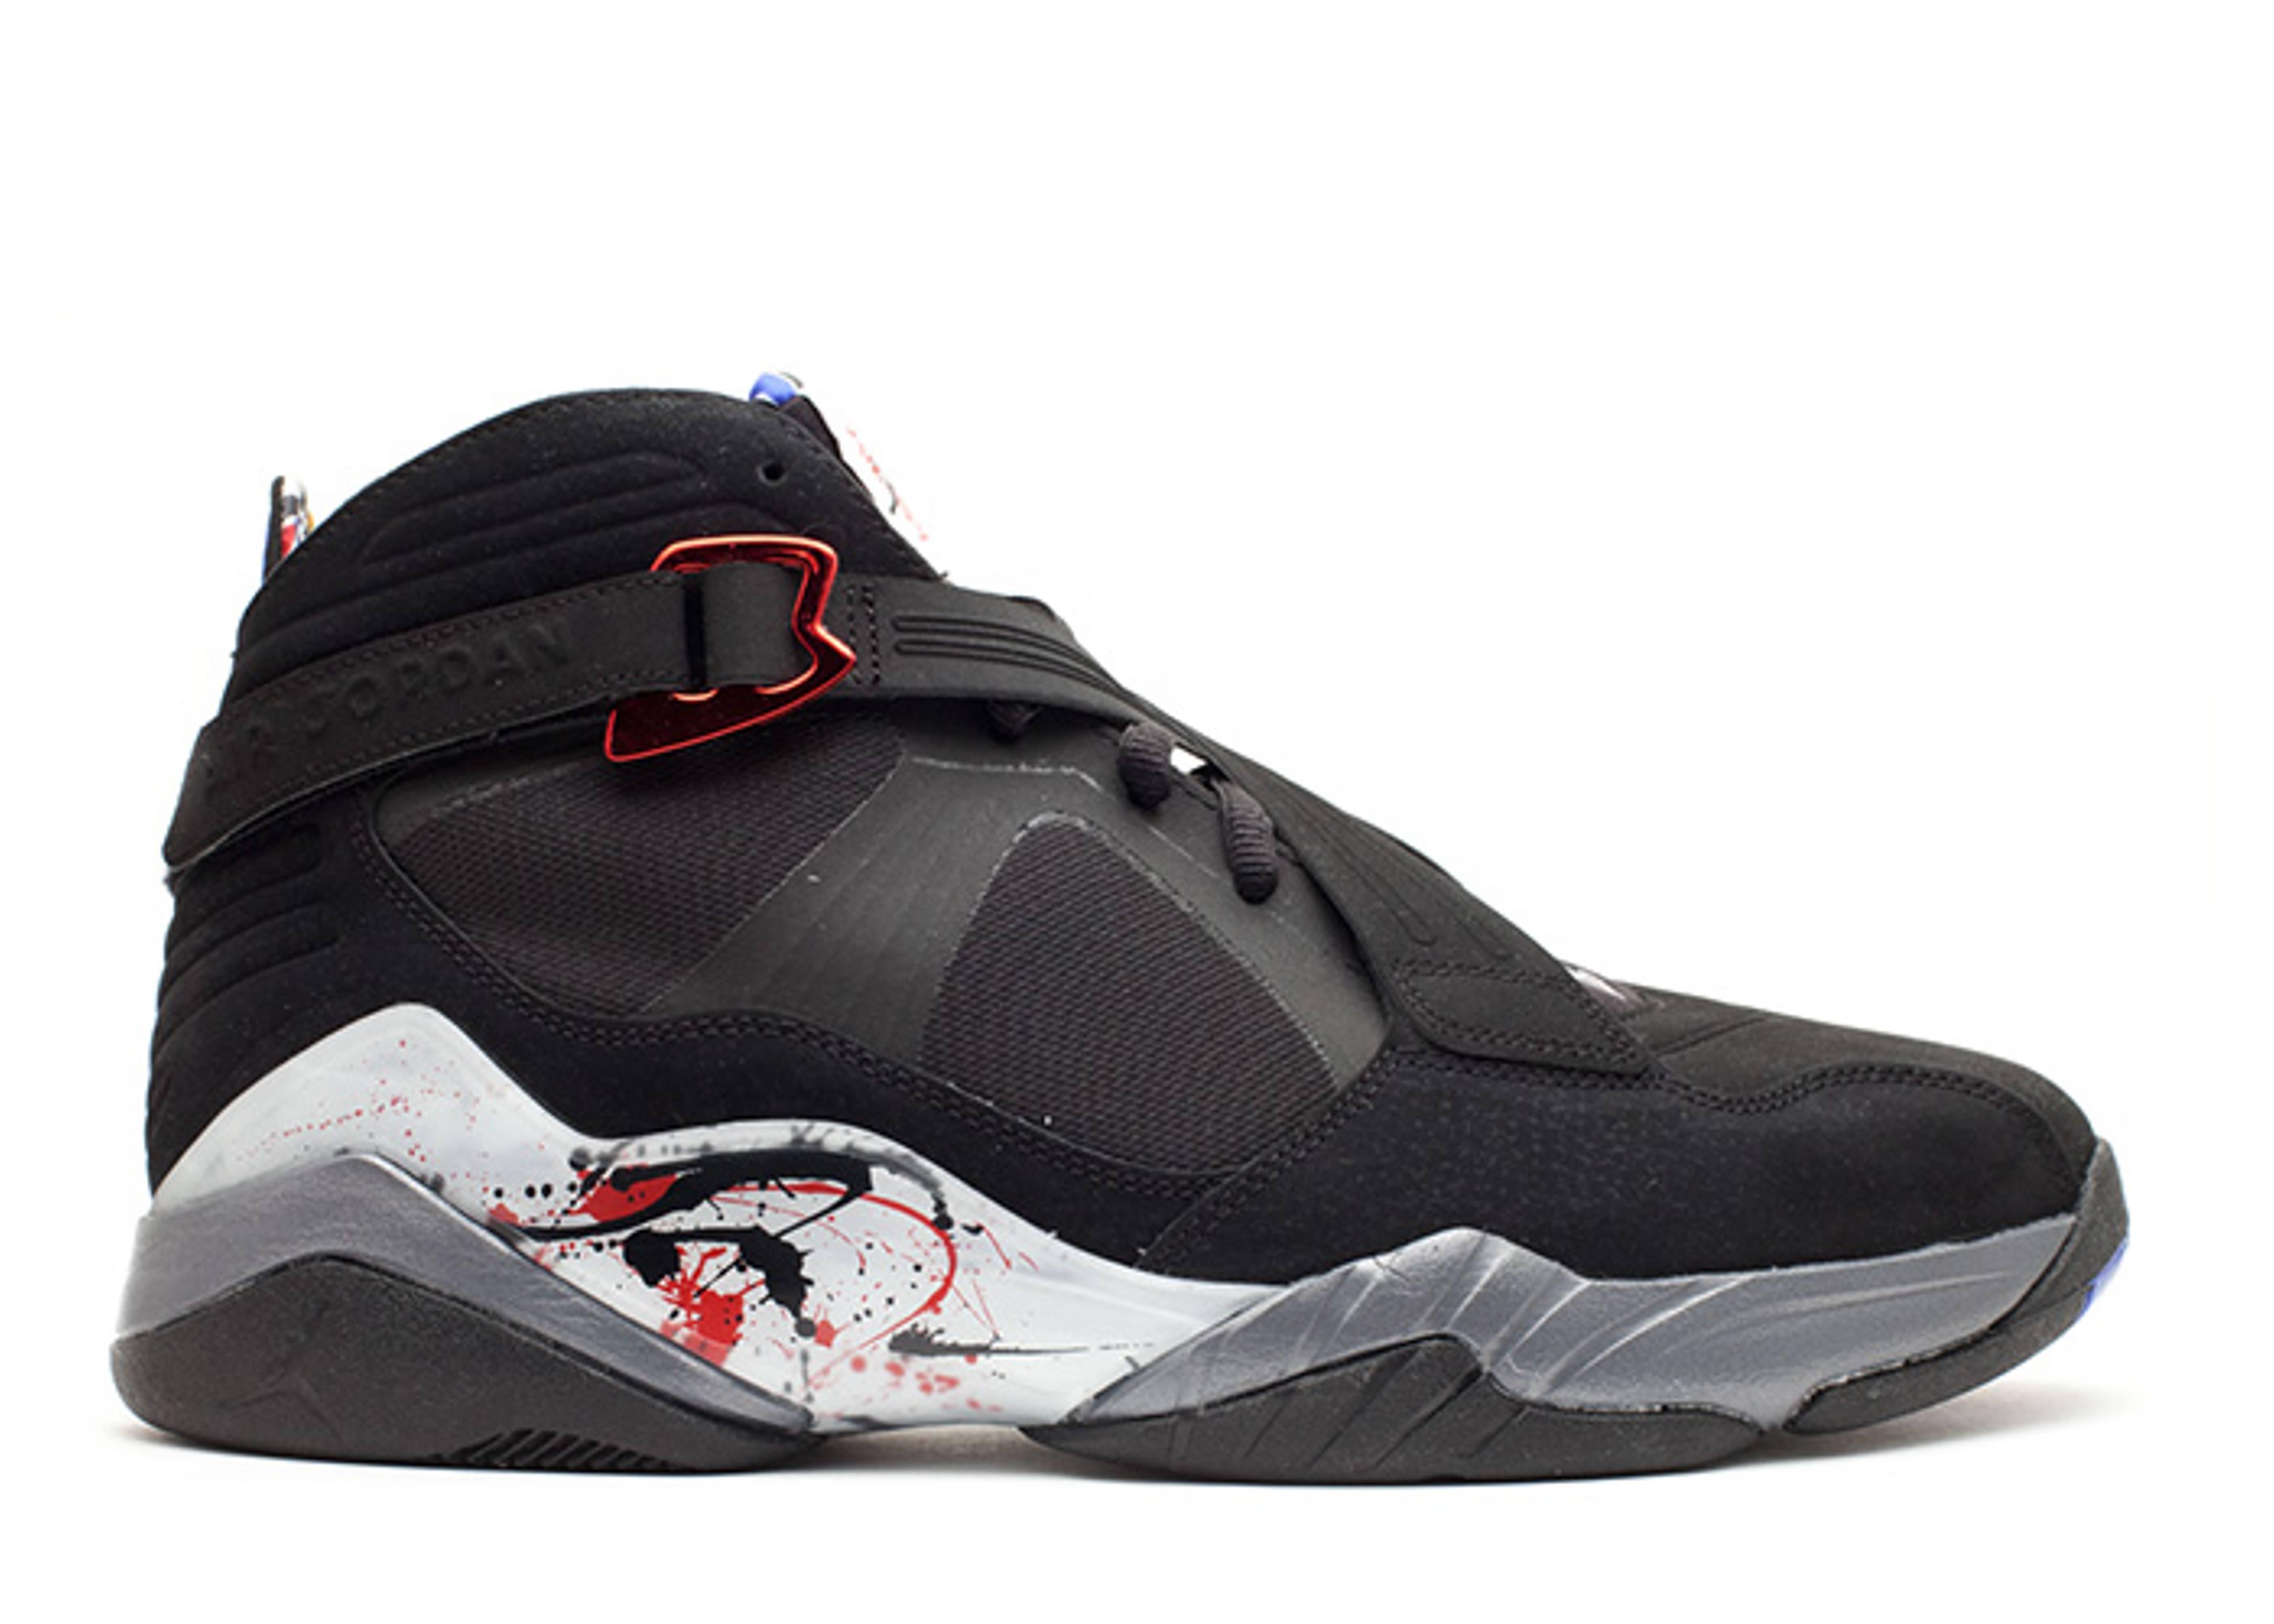 Nike Air Jordan 9.5 Shoe Sneaker 467807-010 8.0 VIII OG Retro Varsity Red Flint